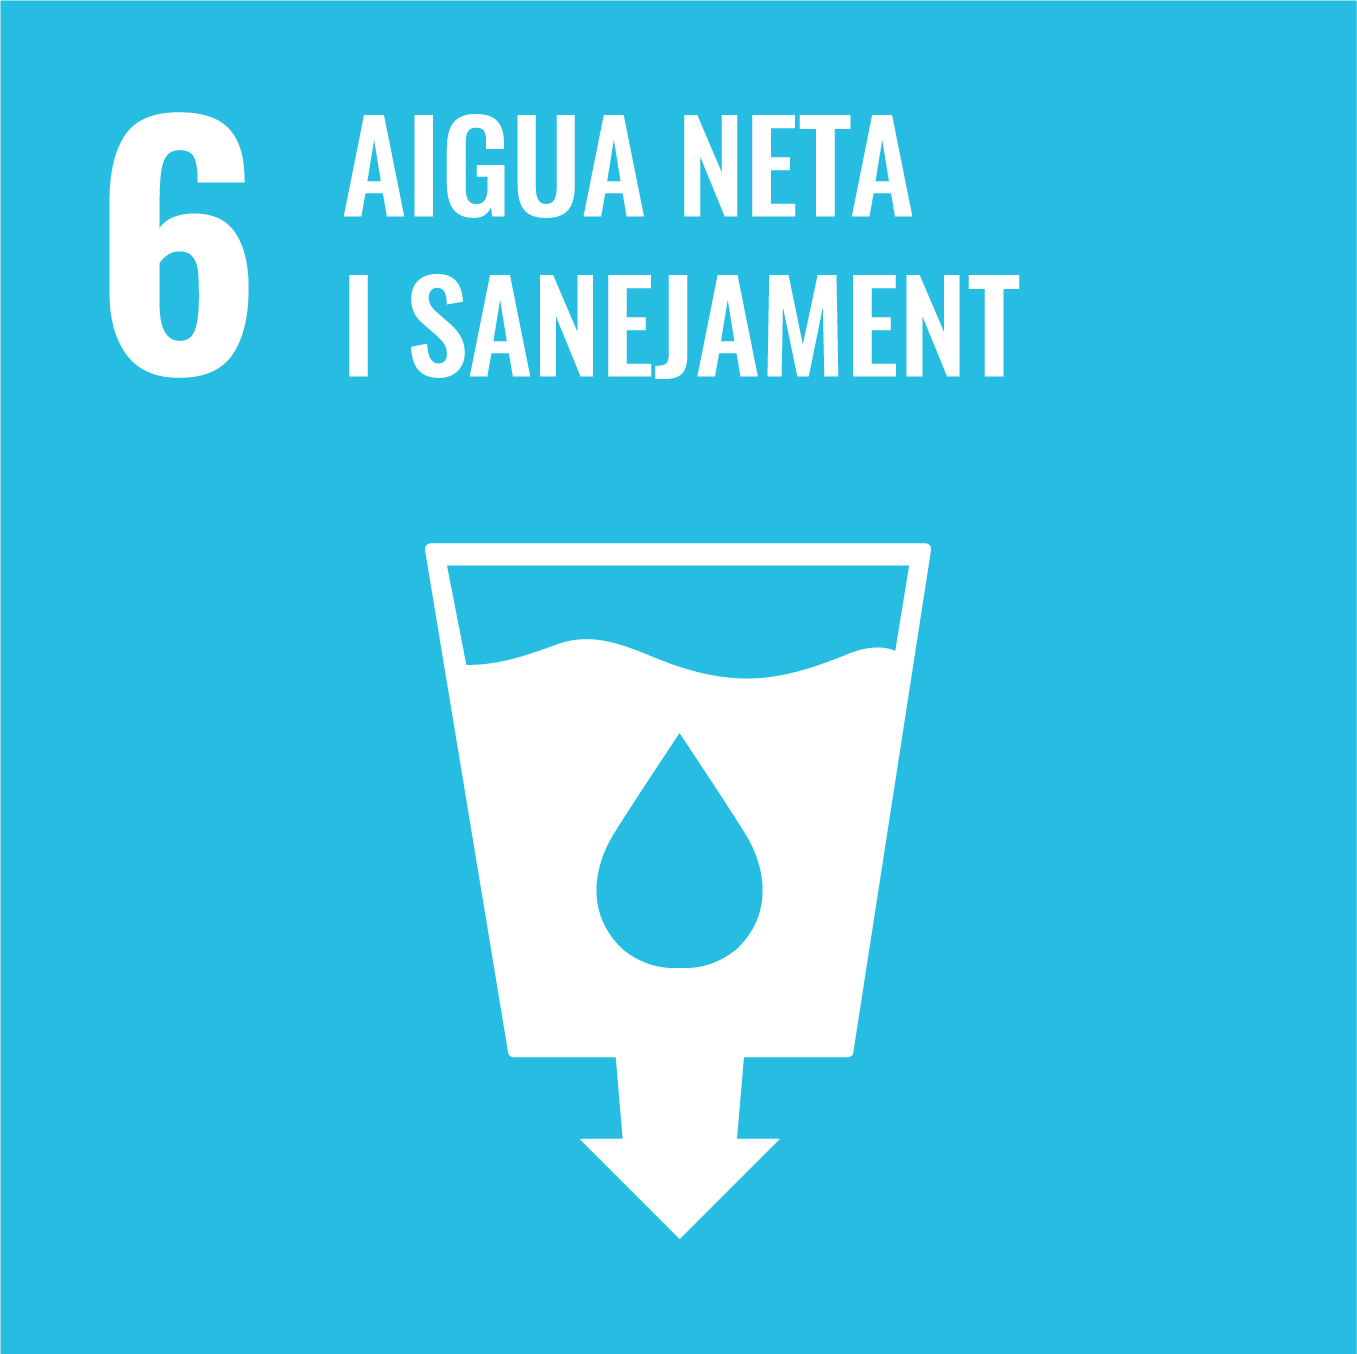 Aigua Neta i Sanejament - Objectiu 6